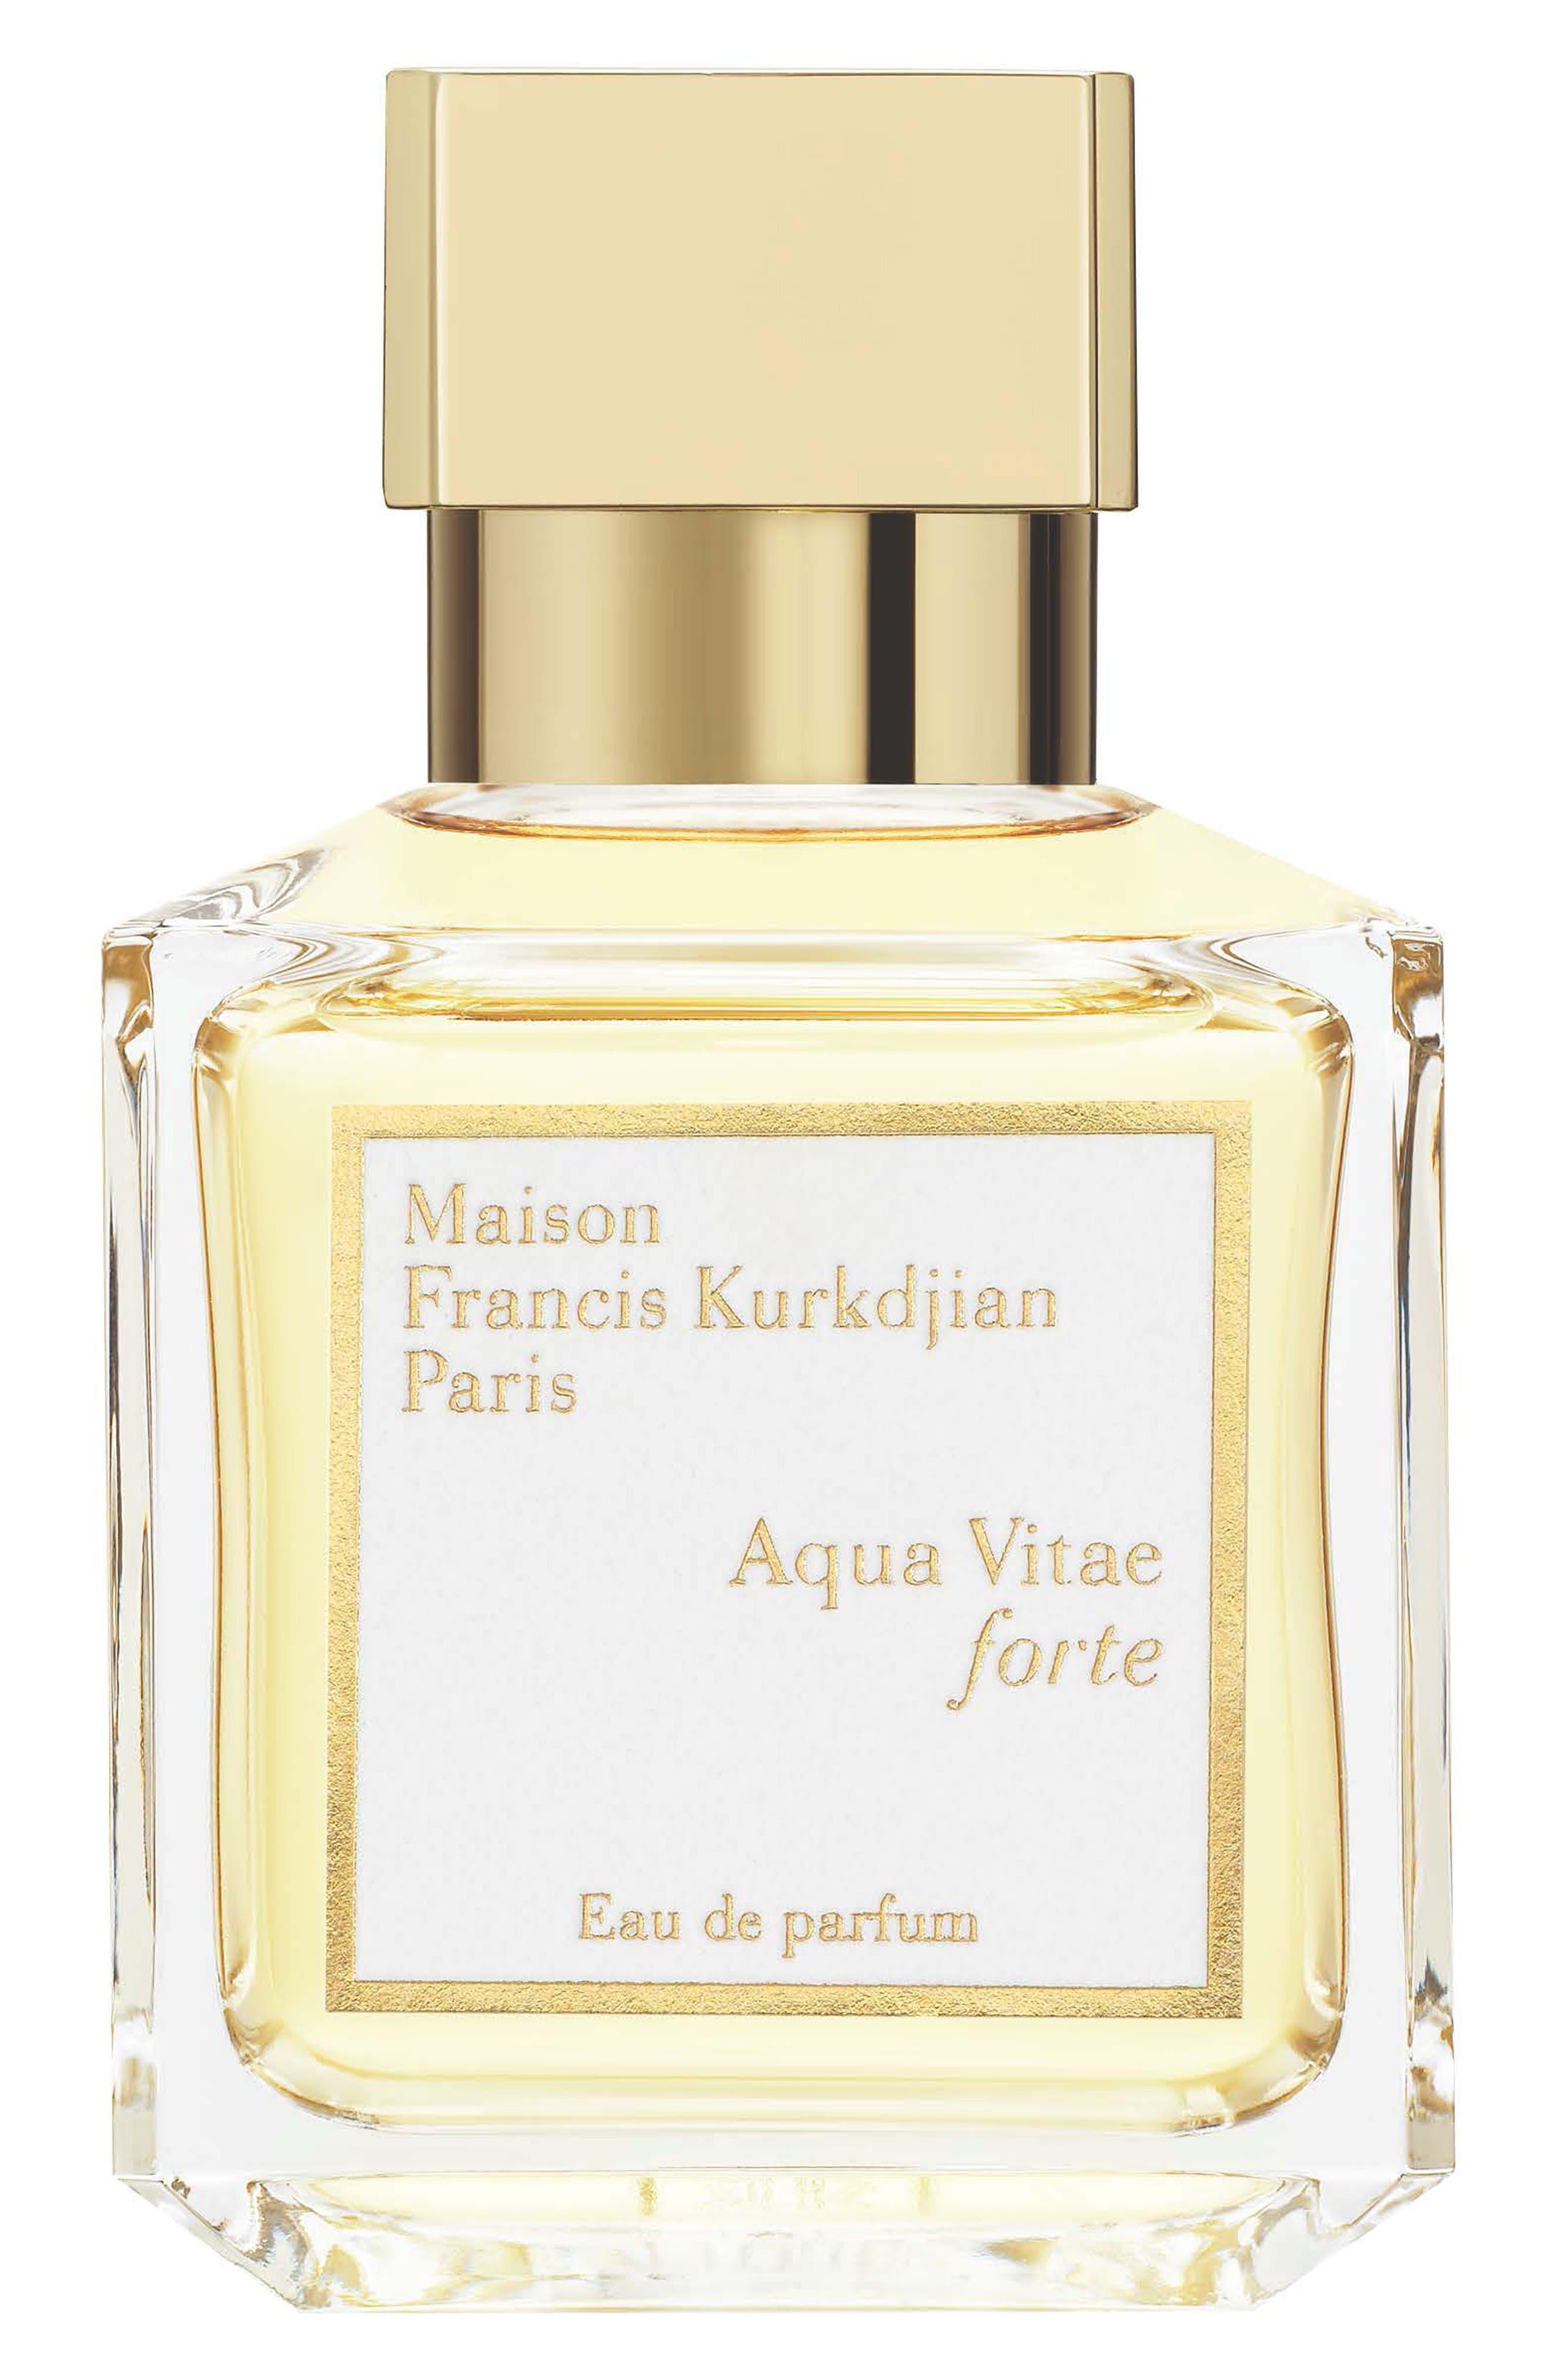 Paris Aqua Vitae Forte Eau De Parfum